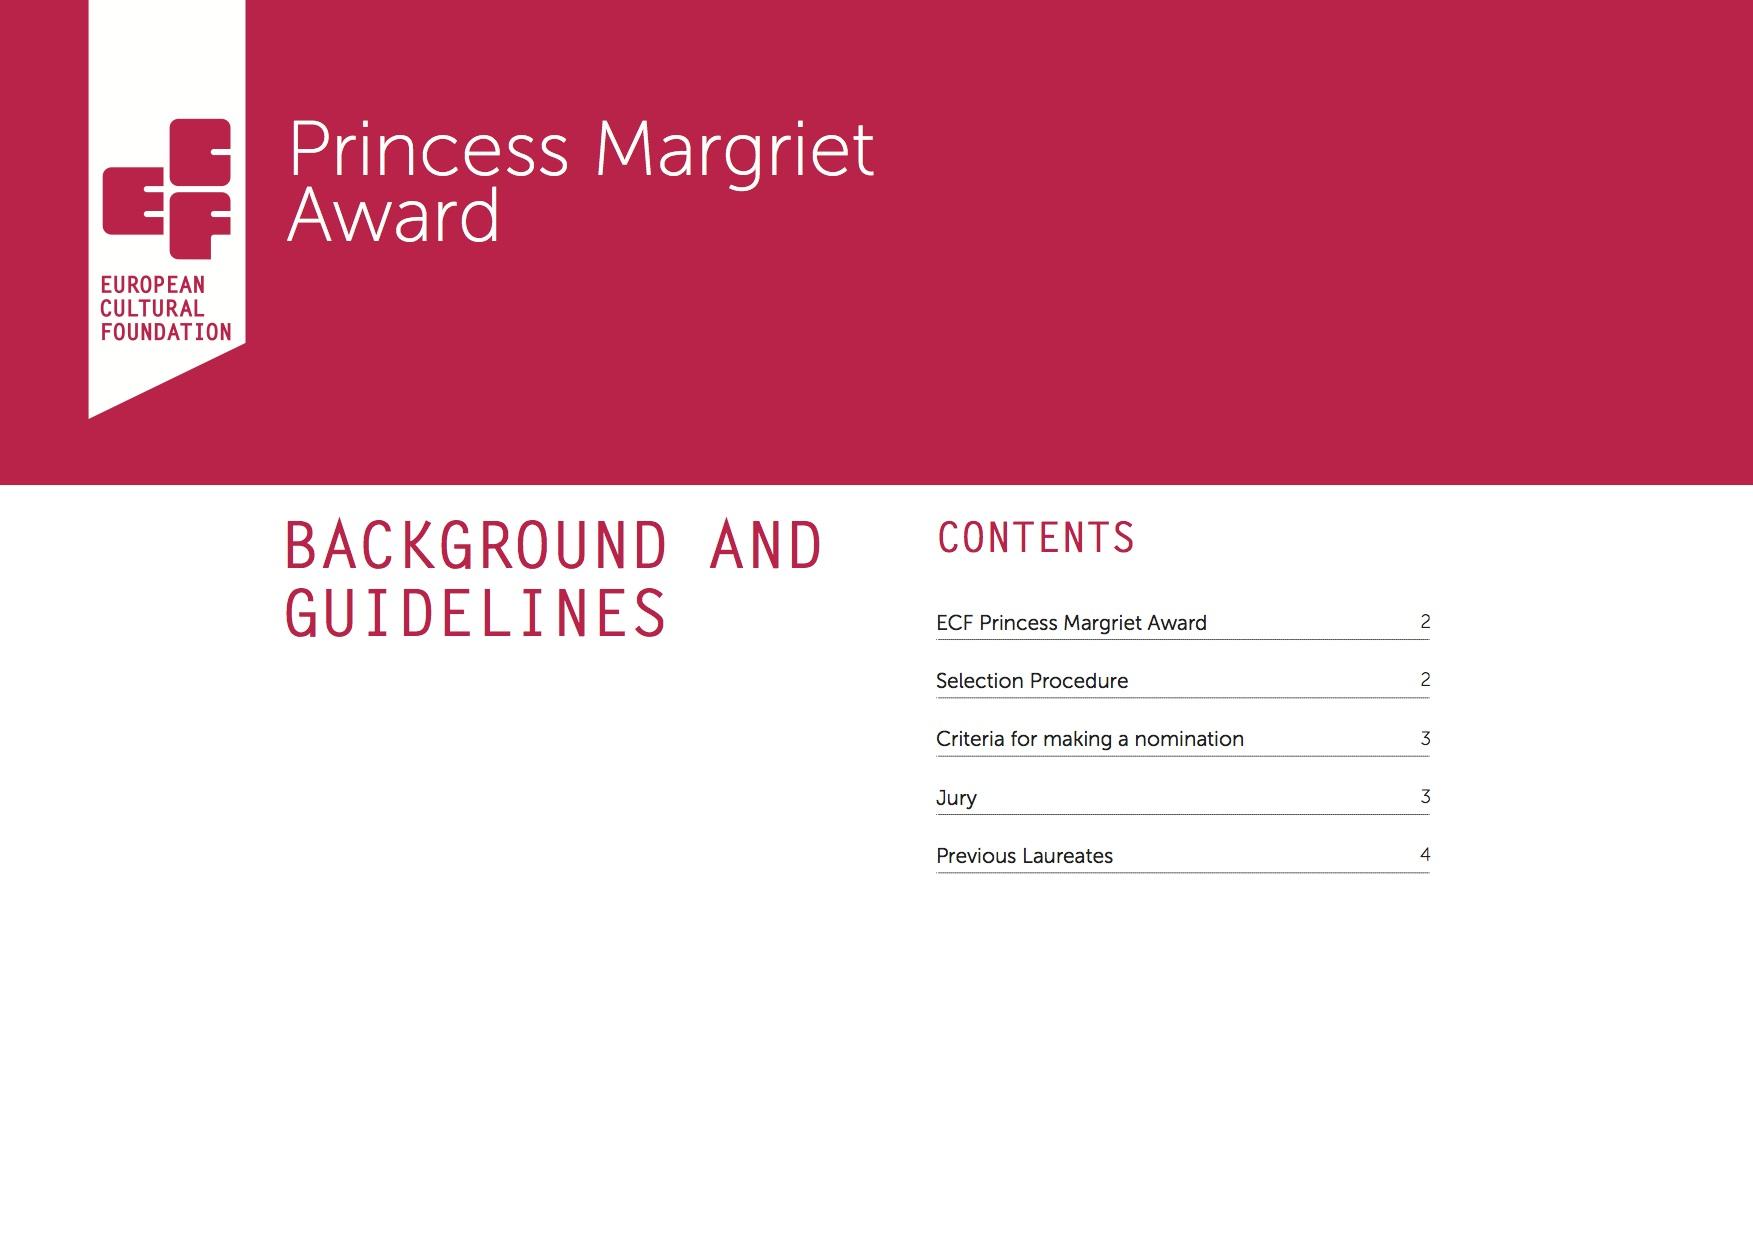 ECF PMA Background & Guidelines 2014.jpg